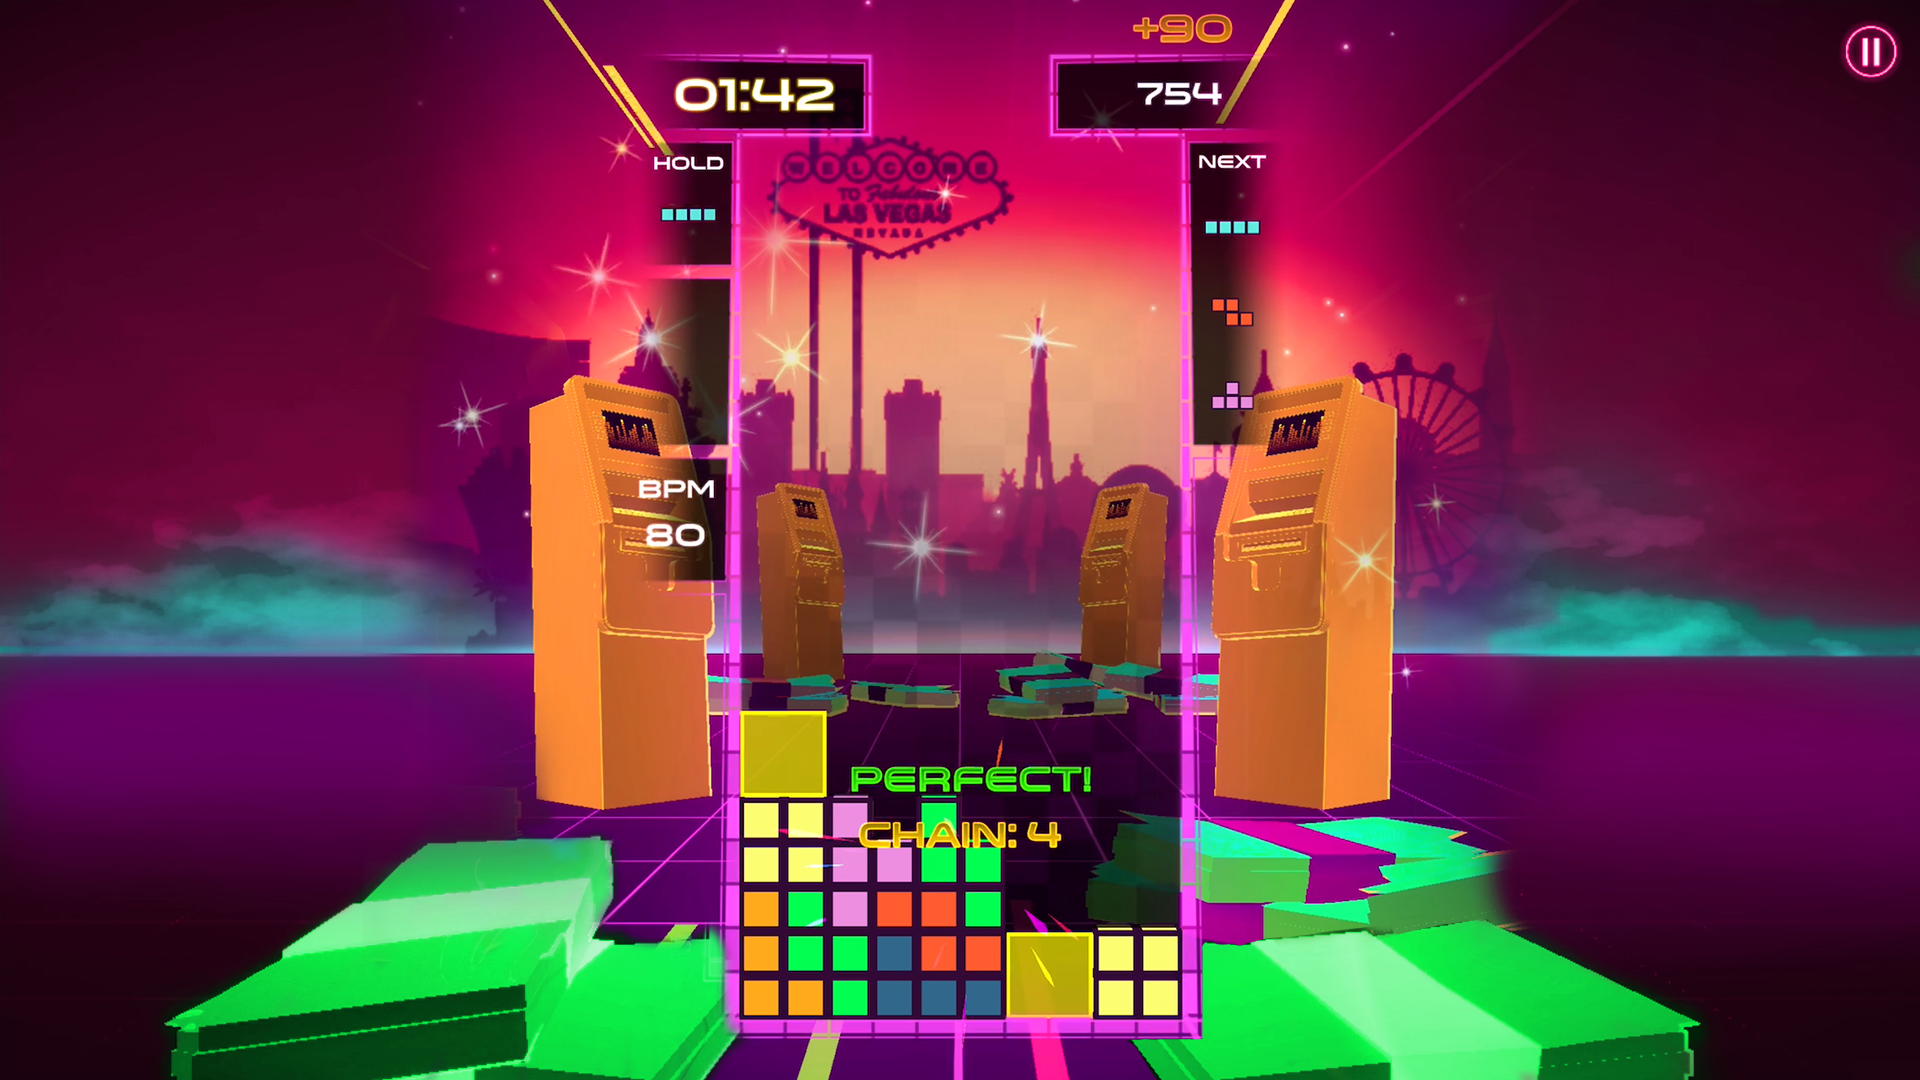 Tetris Beat Will Arrive Soon on Apple Arcade With Unique Music and Rhythm Mechanics